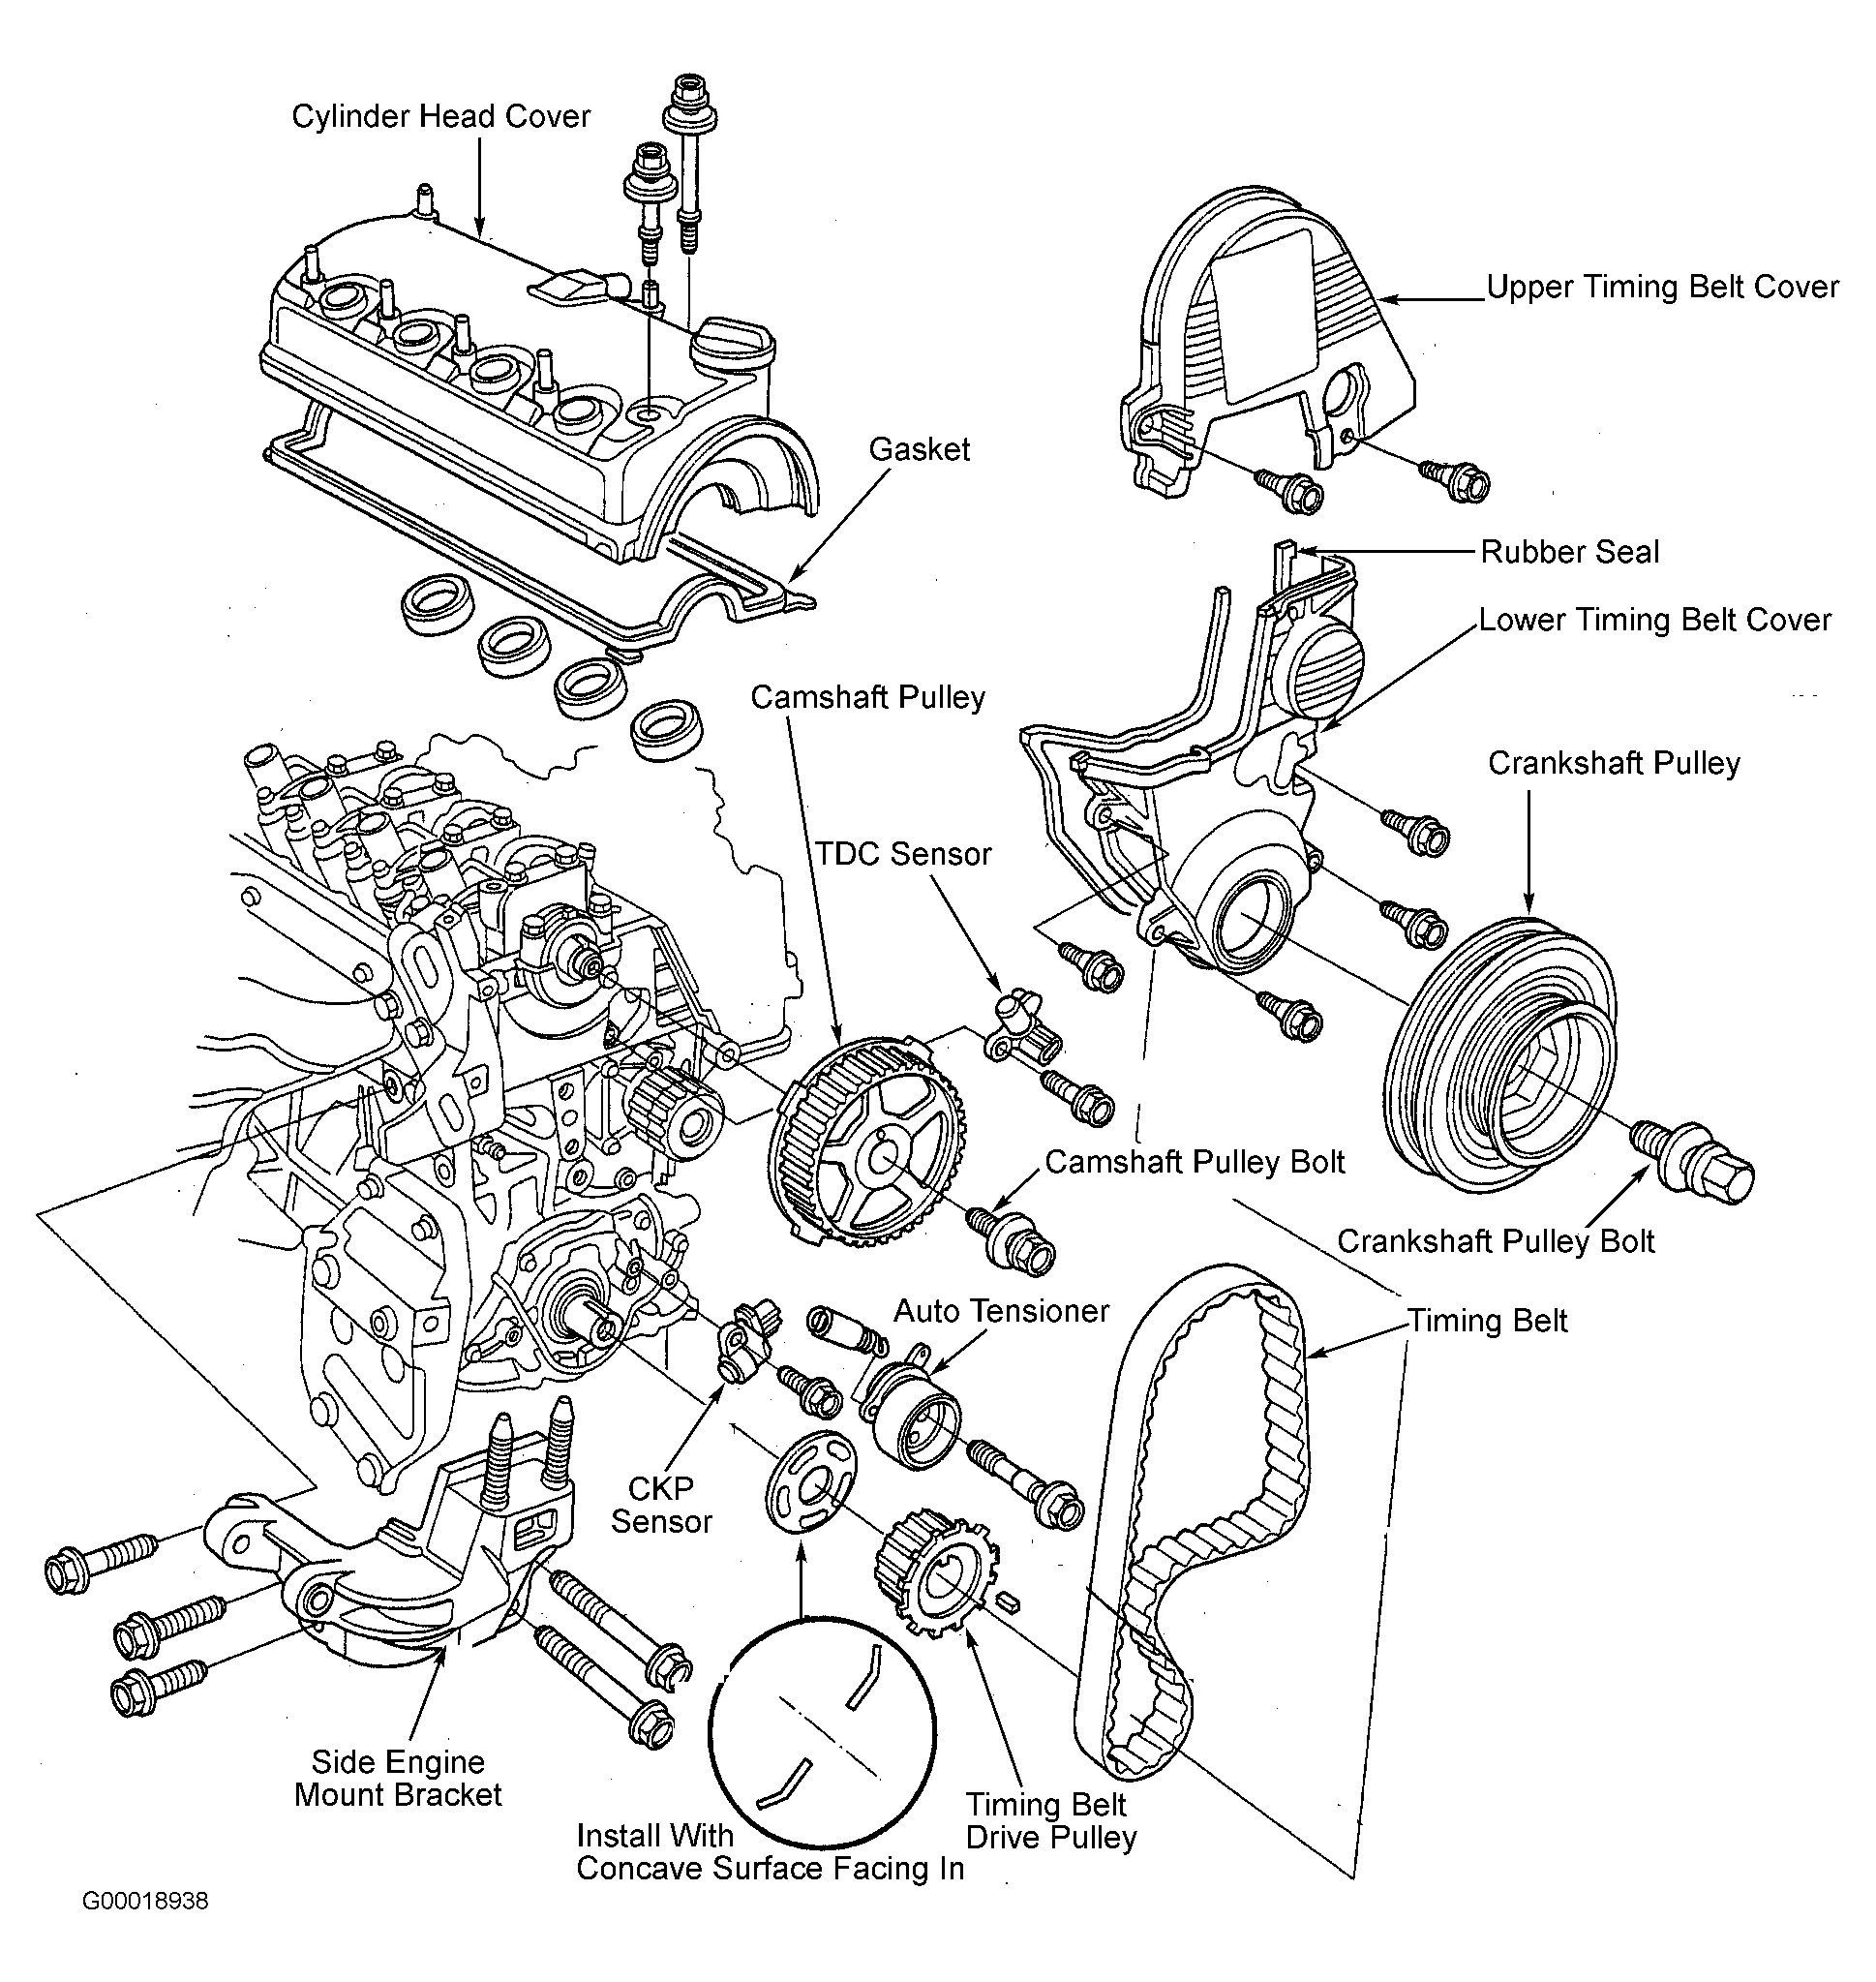 Wiring Diagram Honda Crv 2003 2.4l Car Part Diagram In 2021 Honda Civic Engine, Honda Civic, Honda Of Wiring Diagram Honda Crv 2003 2.4l